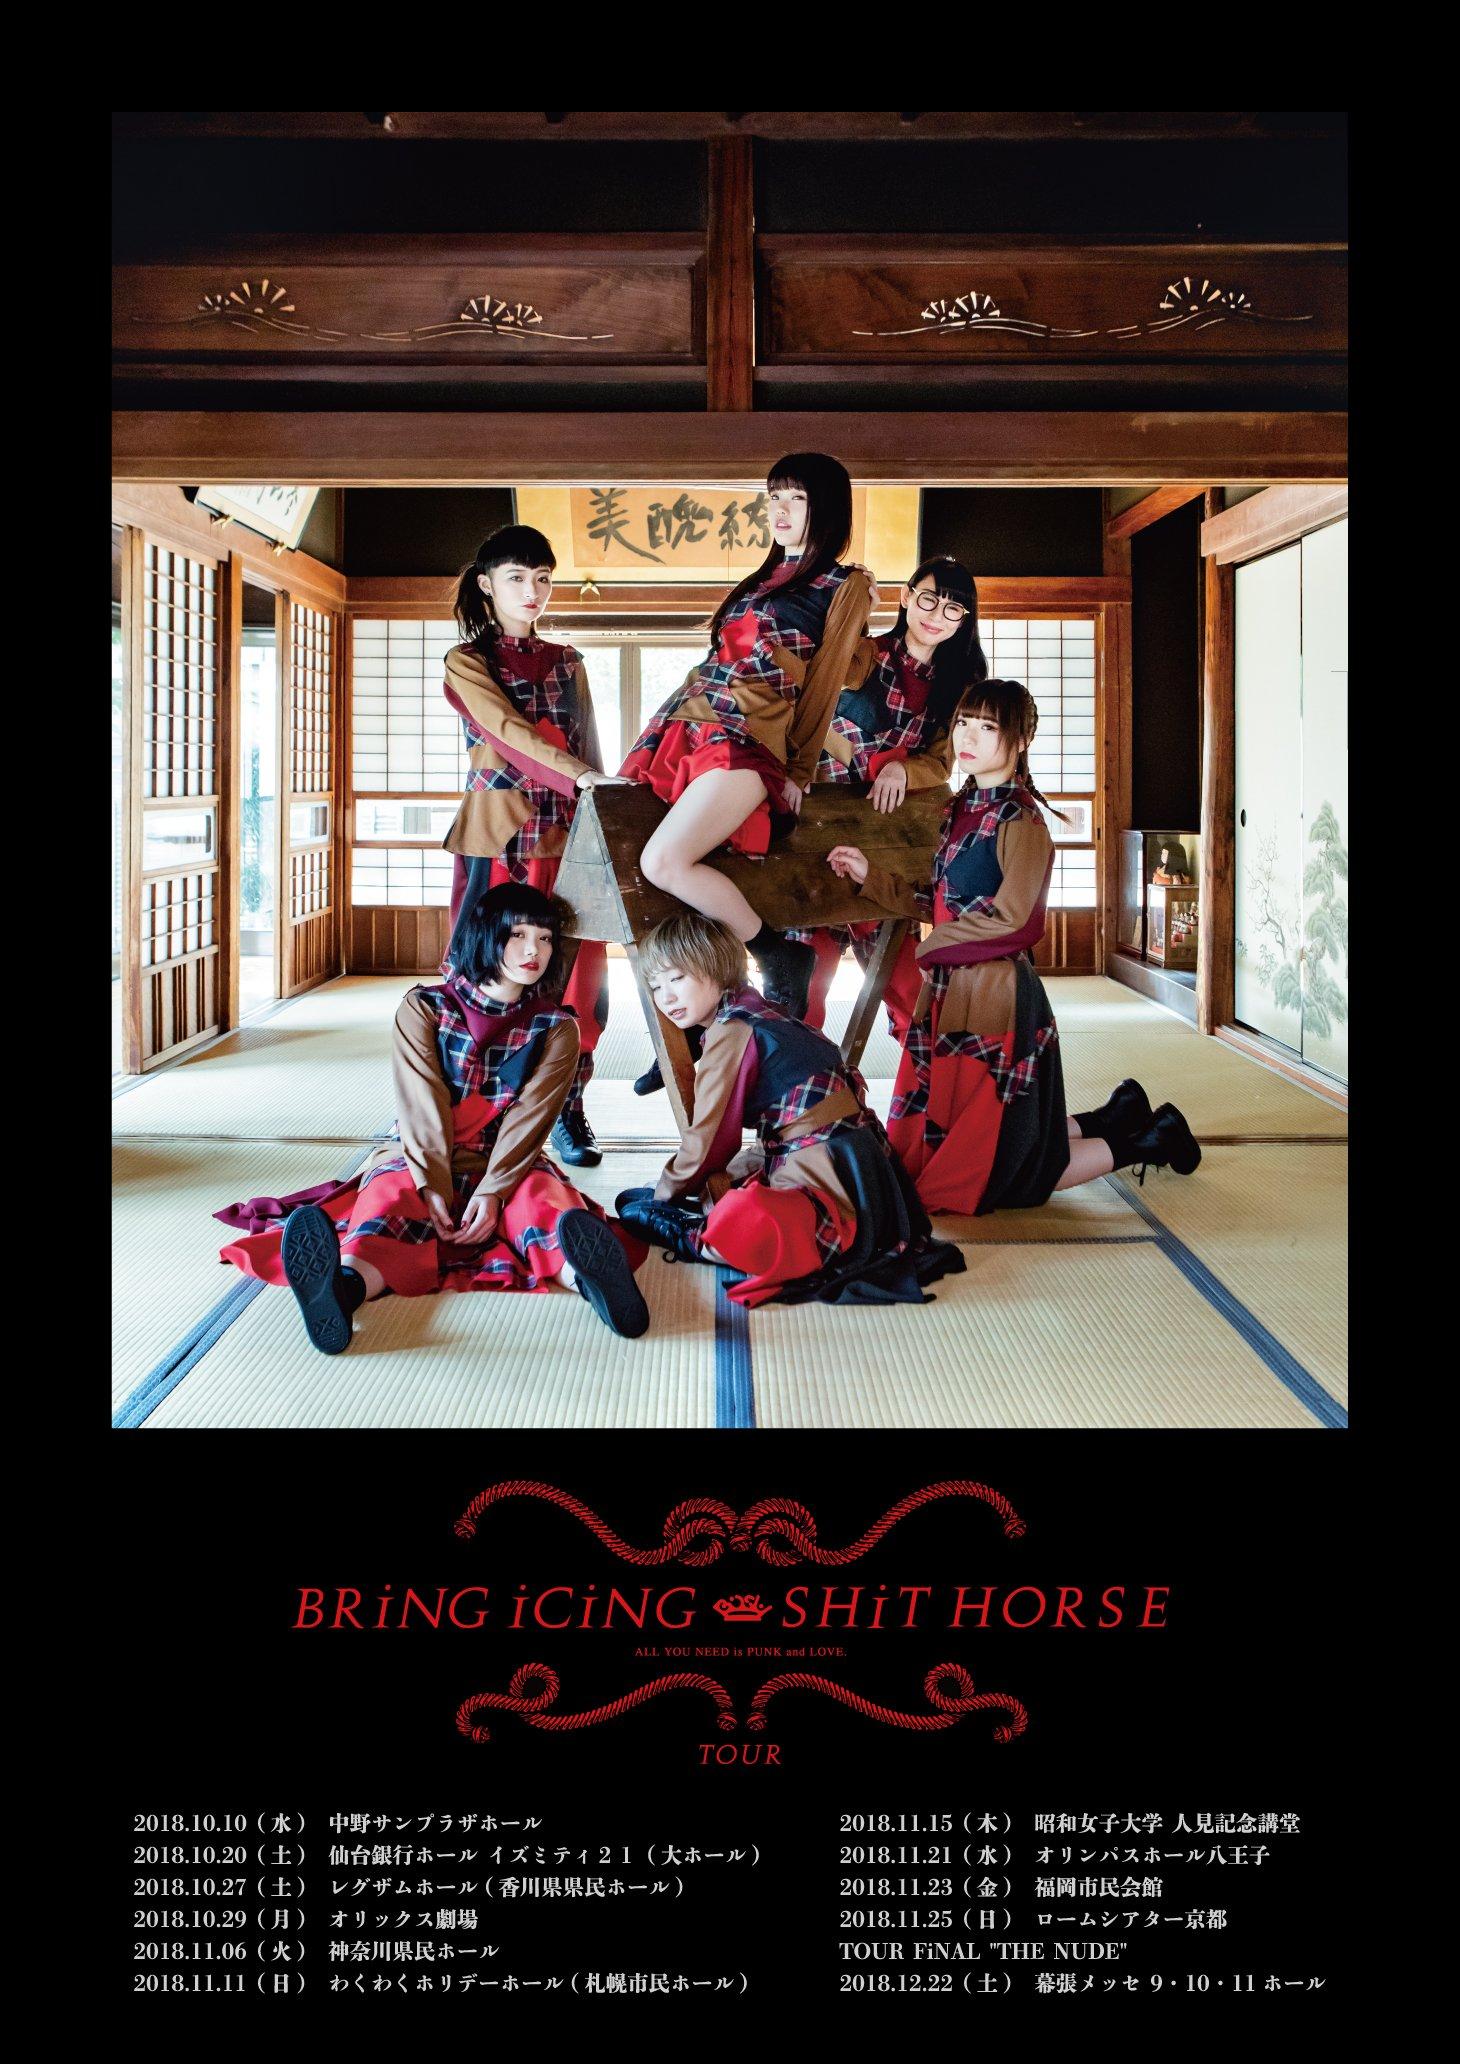 BRiNG iCiNG SHiT HORSE TOUR